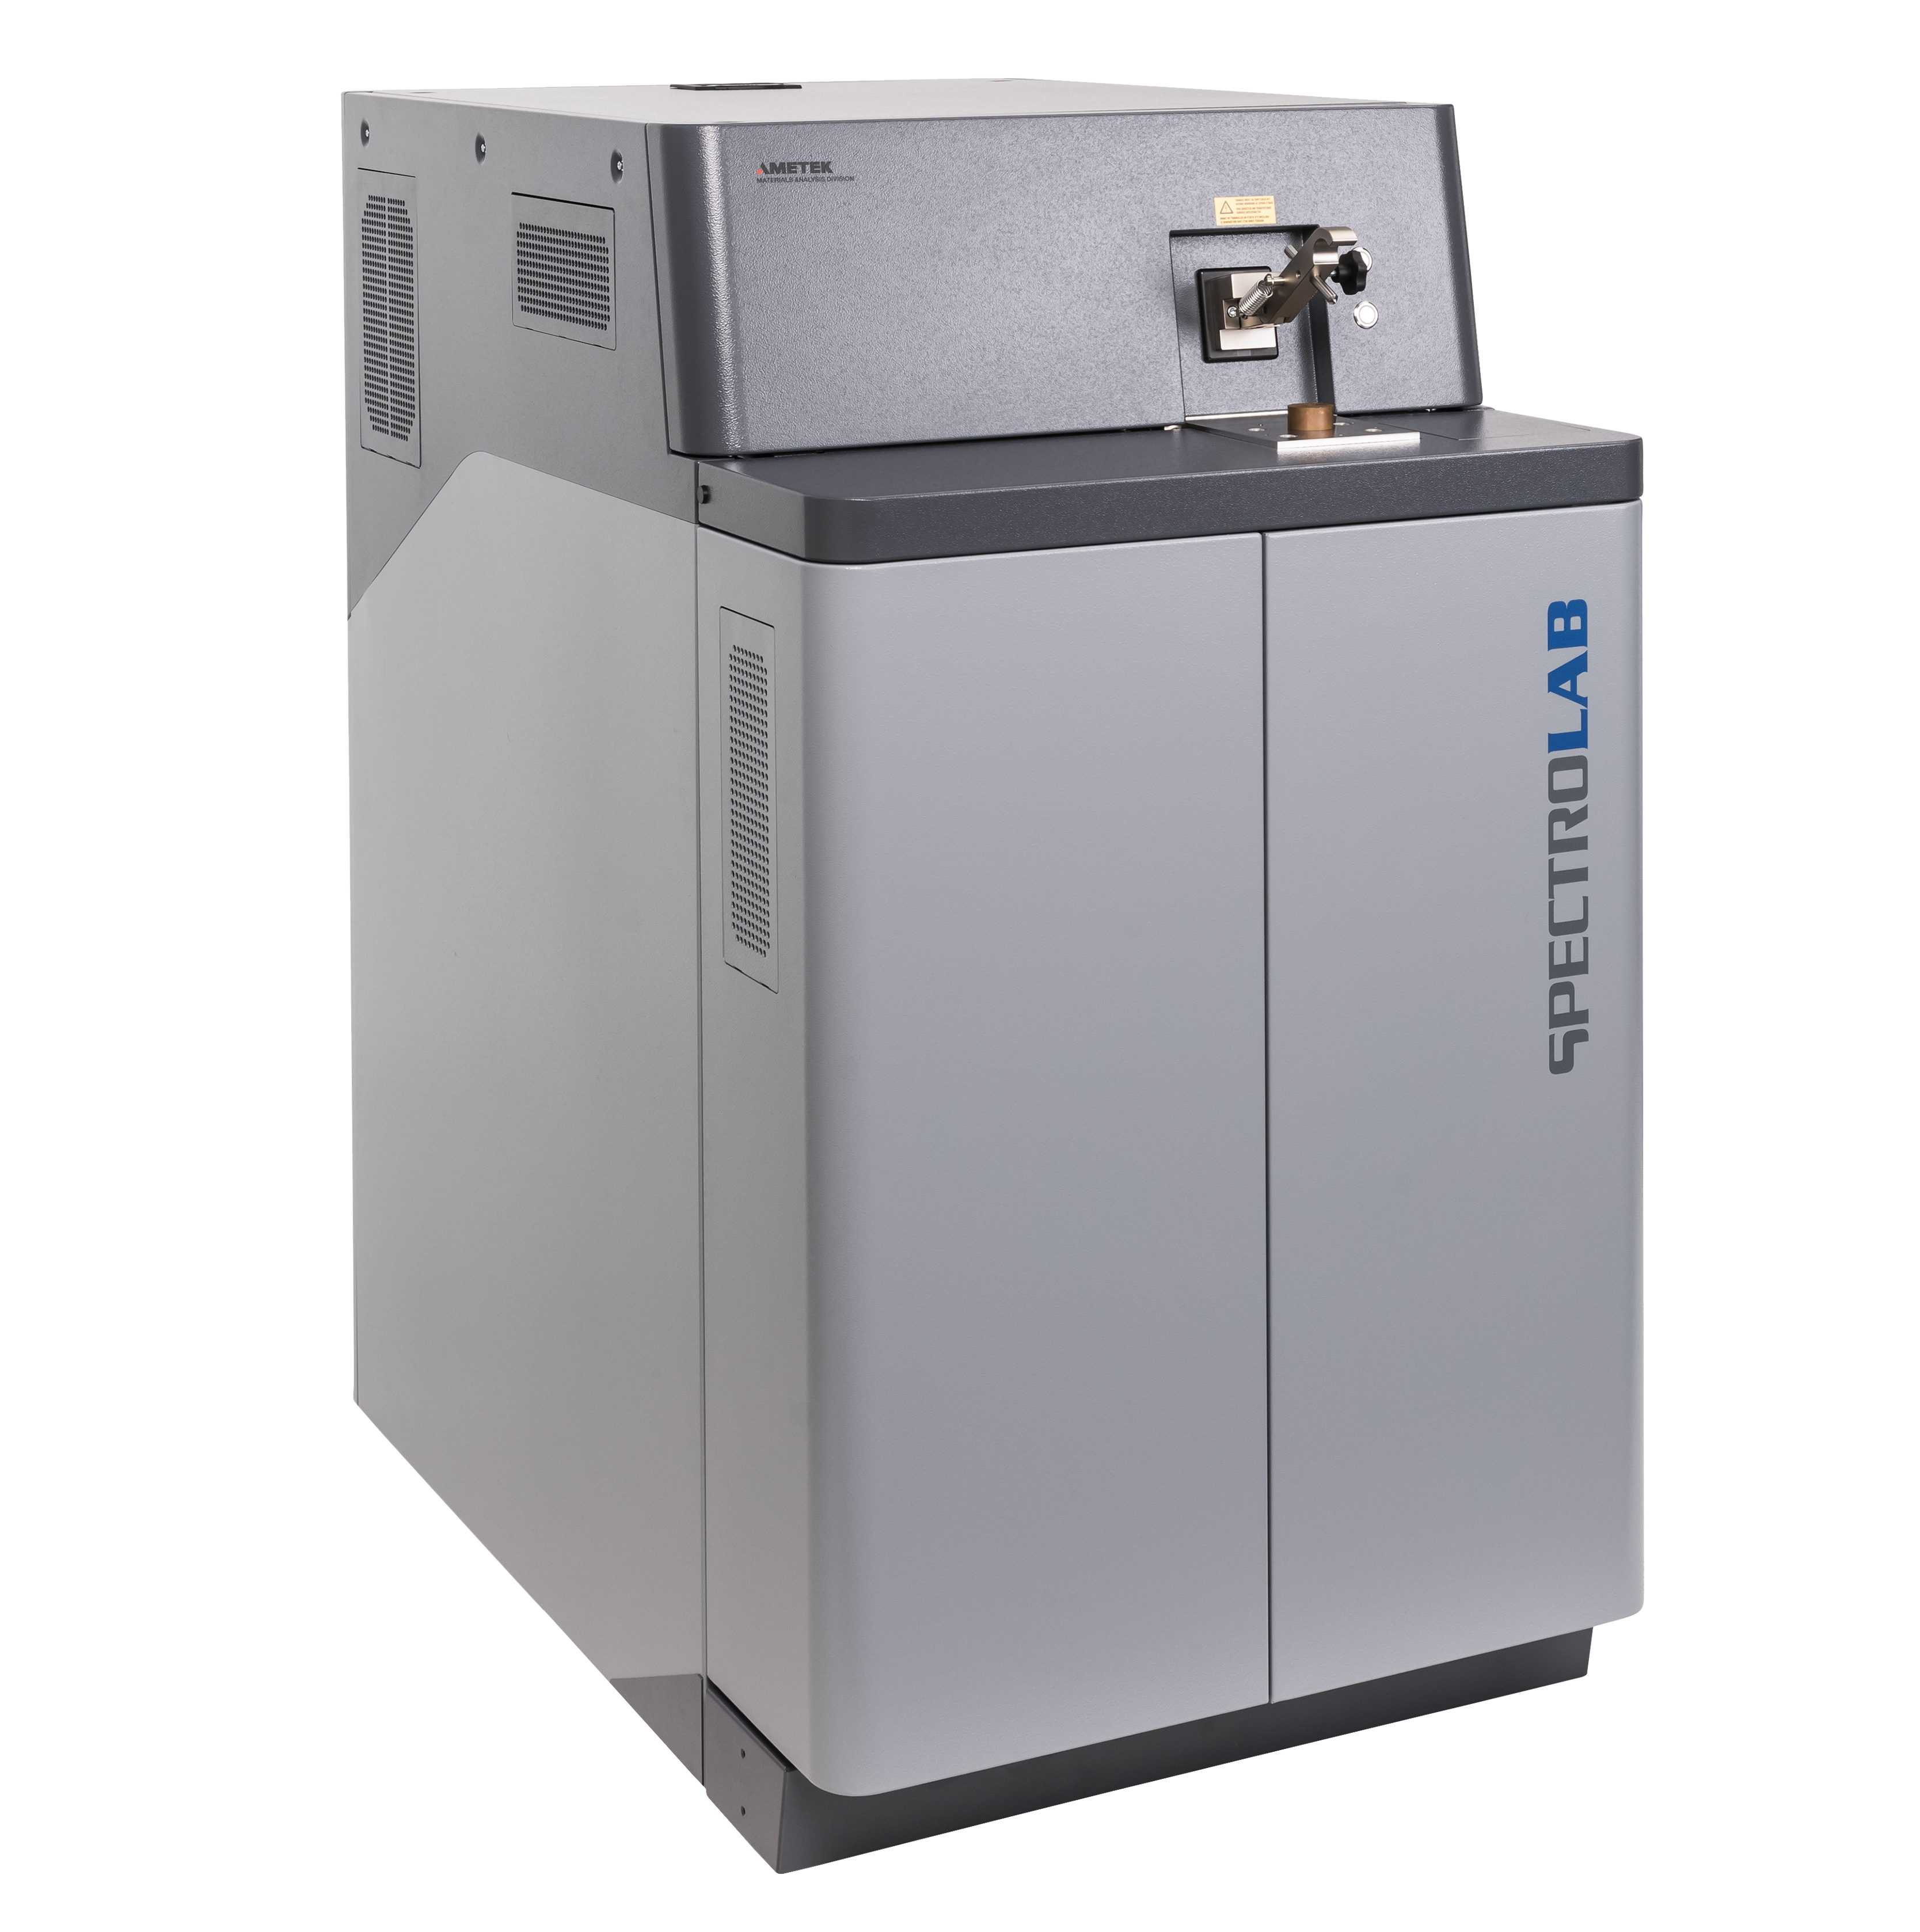 Espectrómetro Spectrolab S